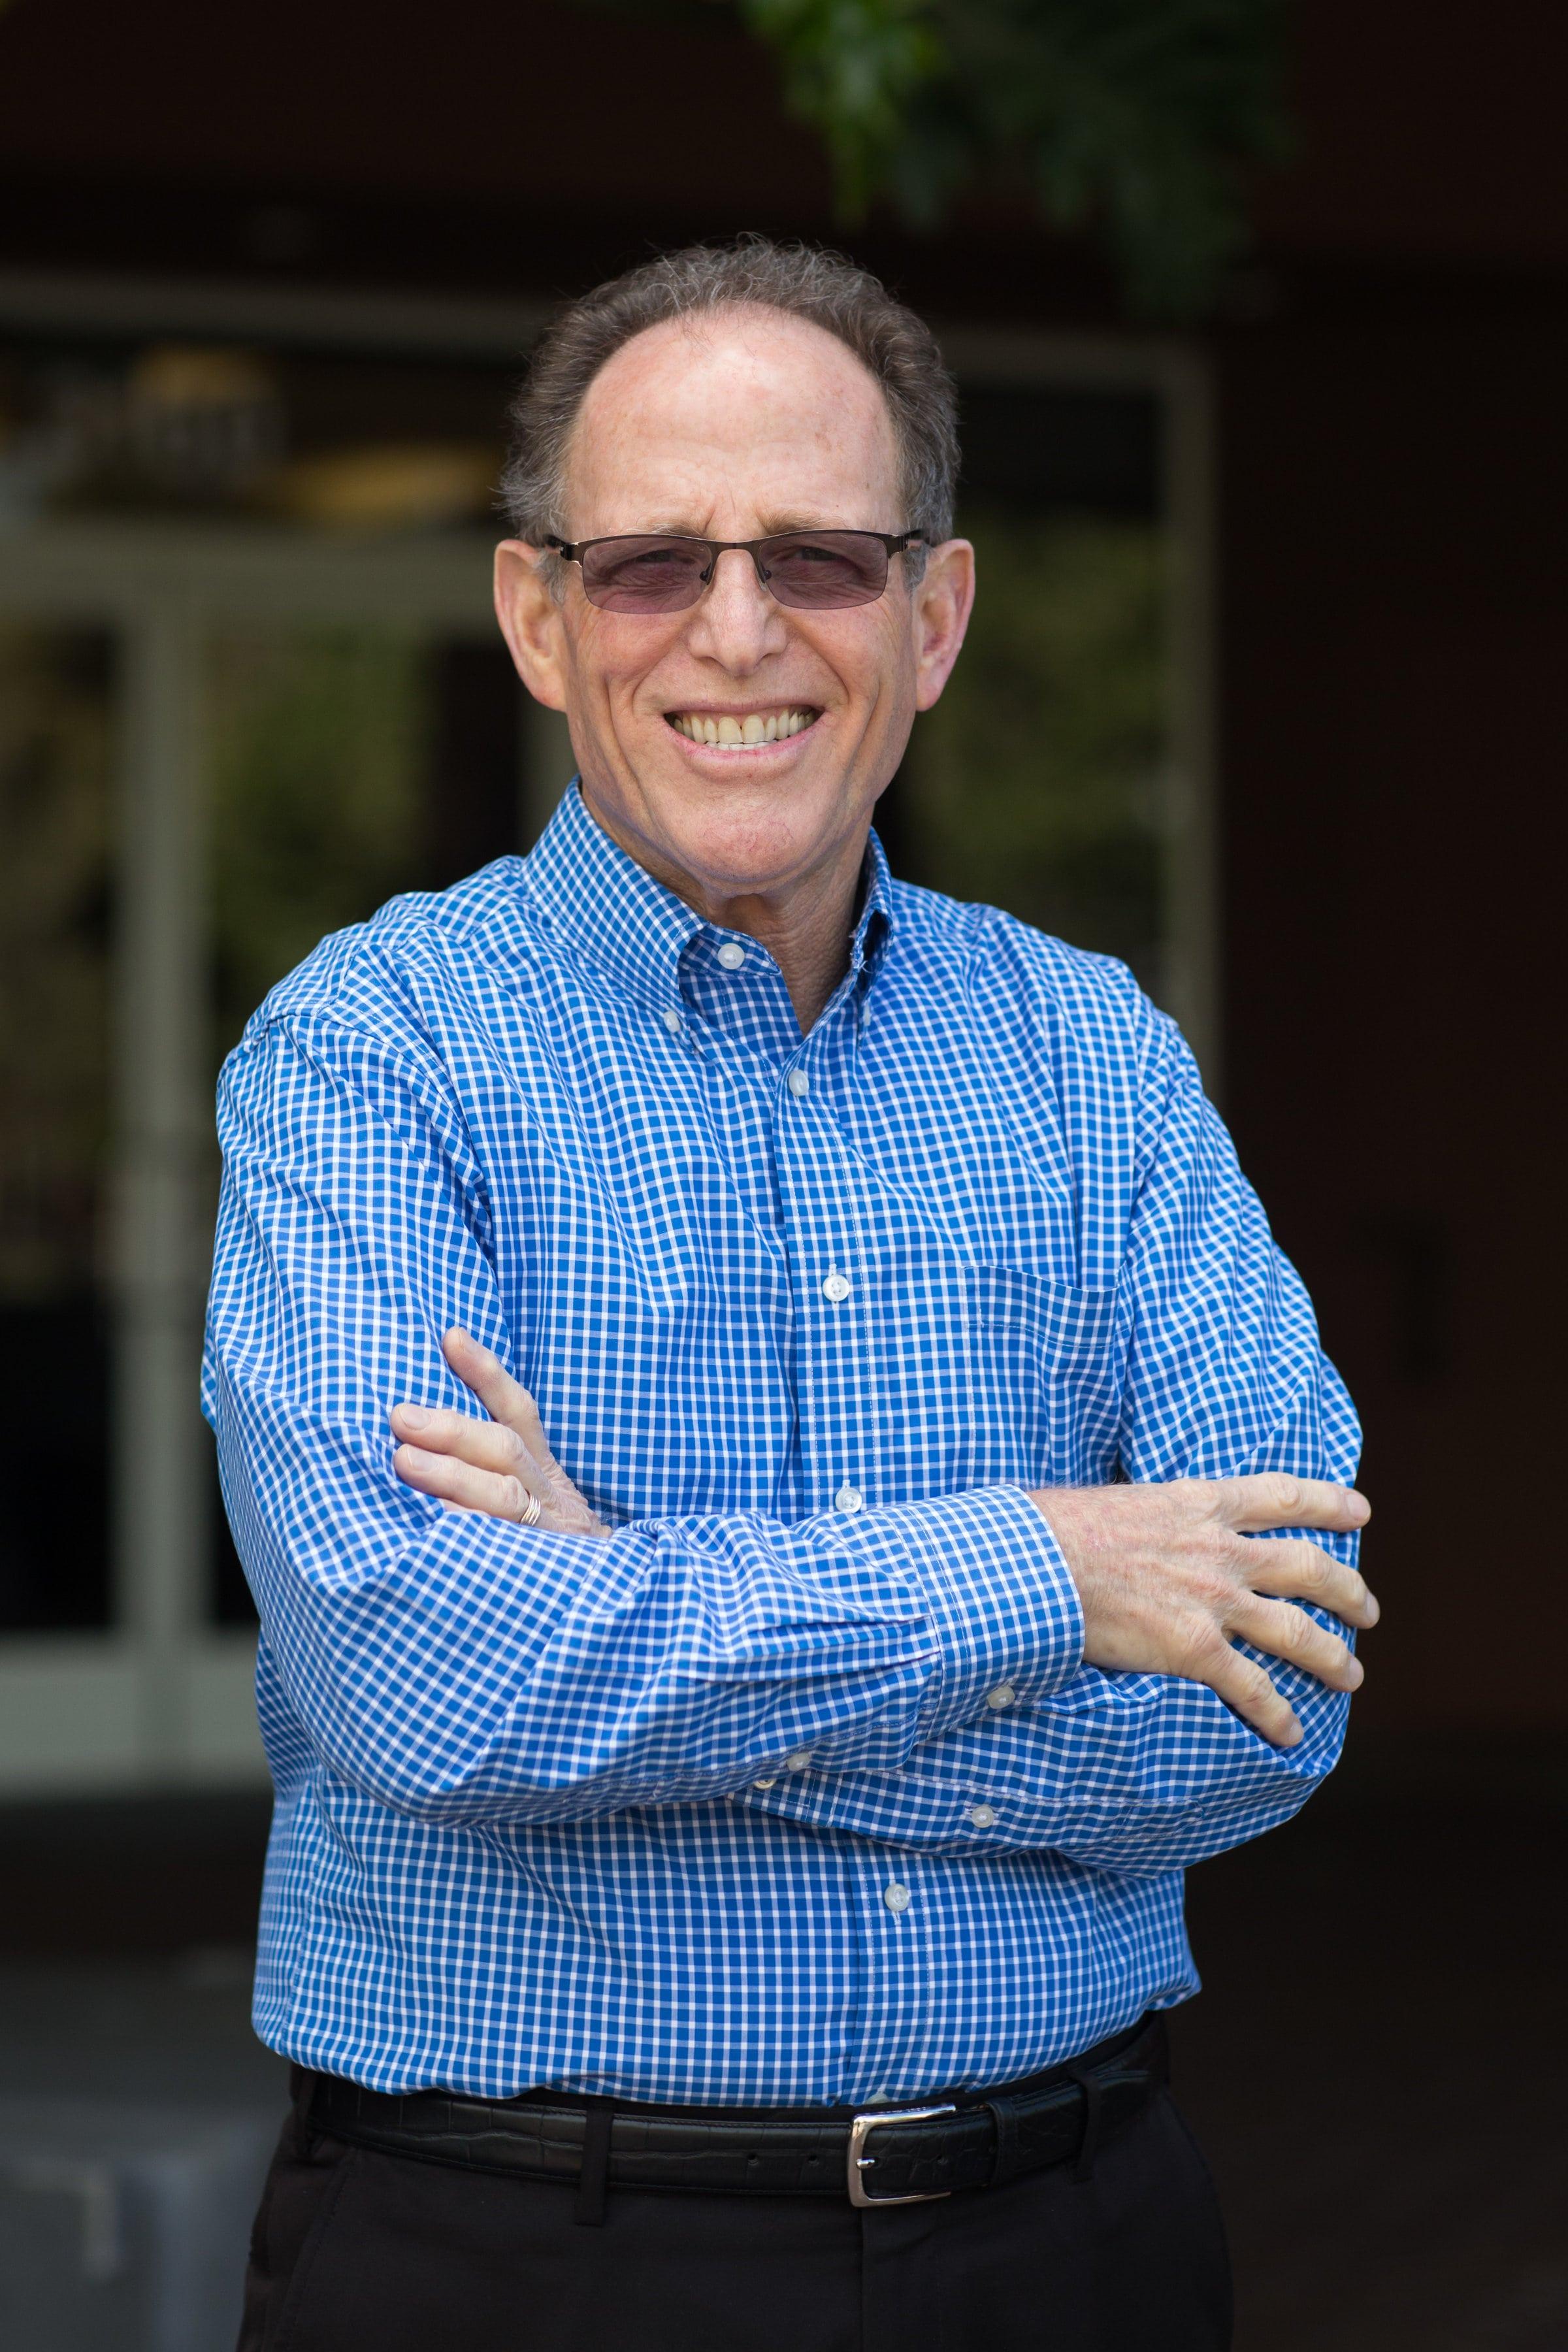 Dr. Brent J. Waterman, D.C., C.C.S.P.